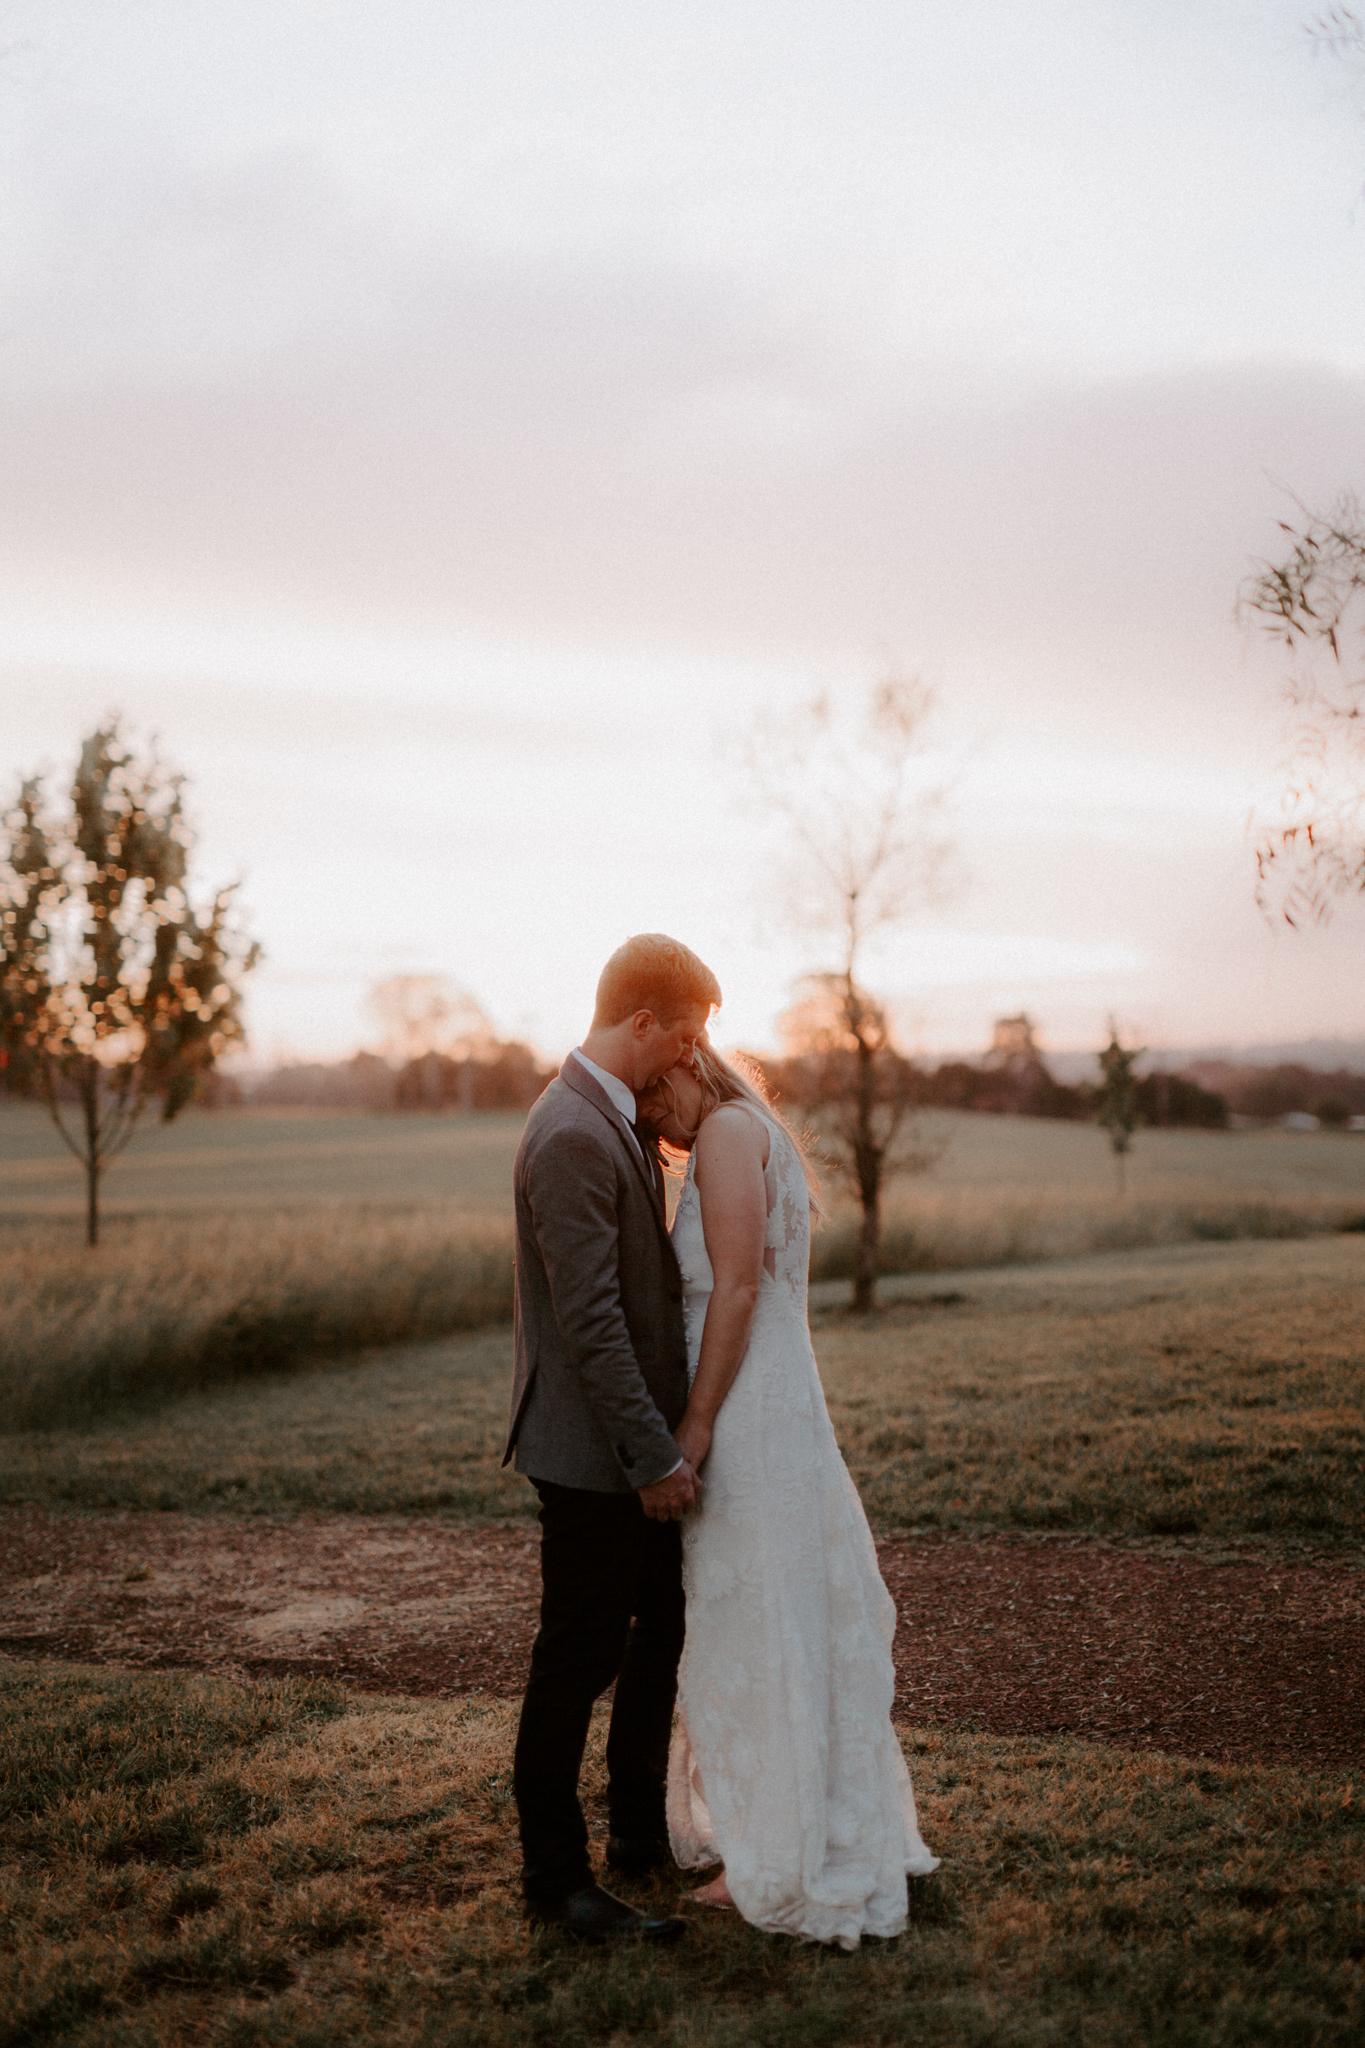 Wandin-Park-Estate-Wedding-Emotions-and-Math-Photography-215.jpg